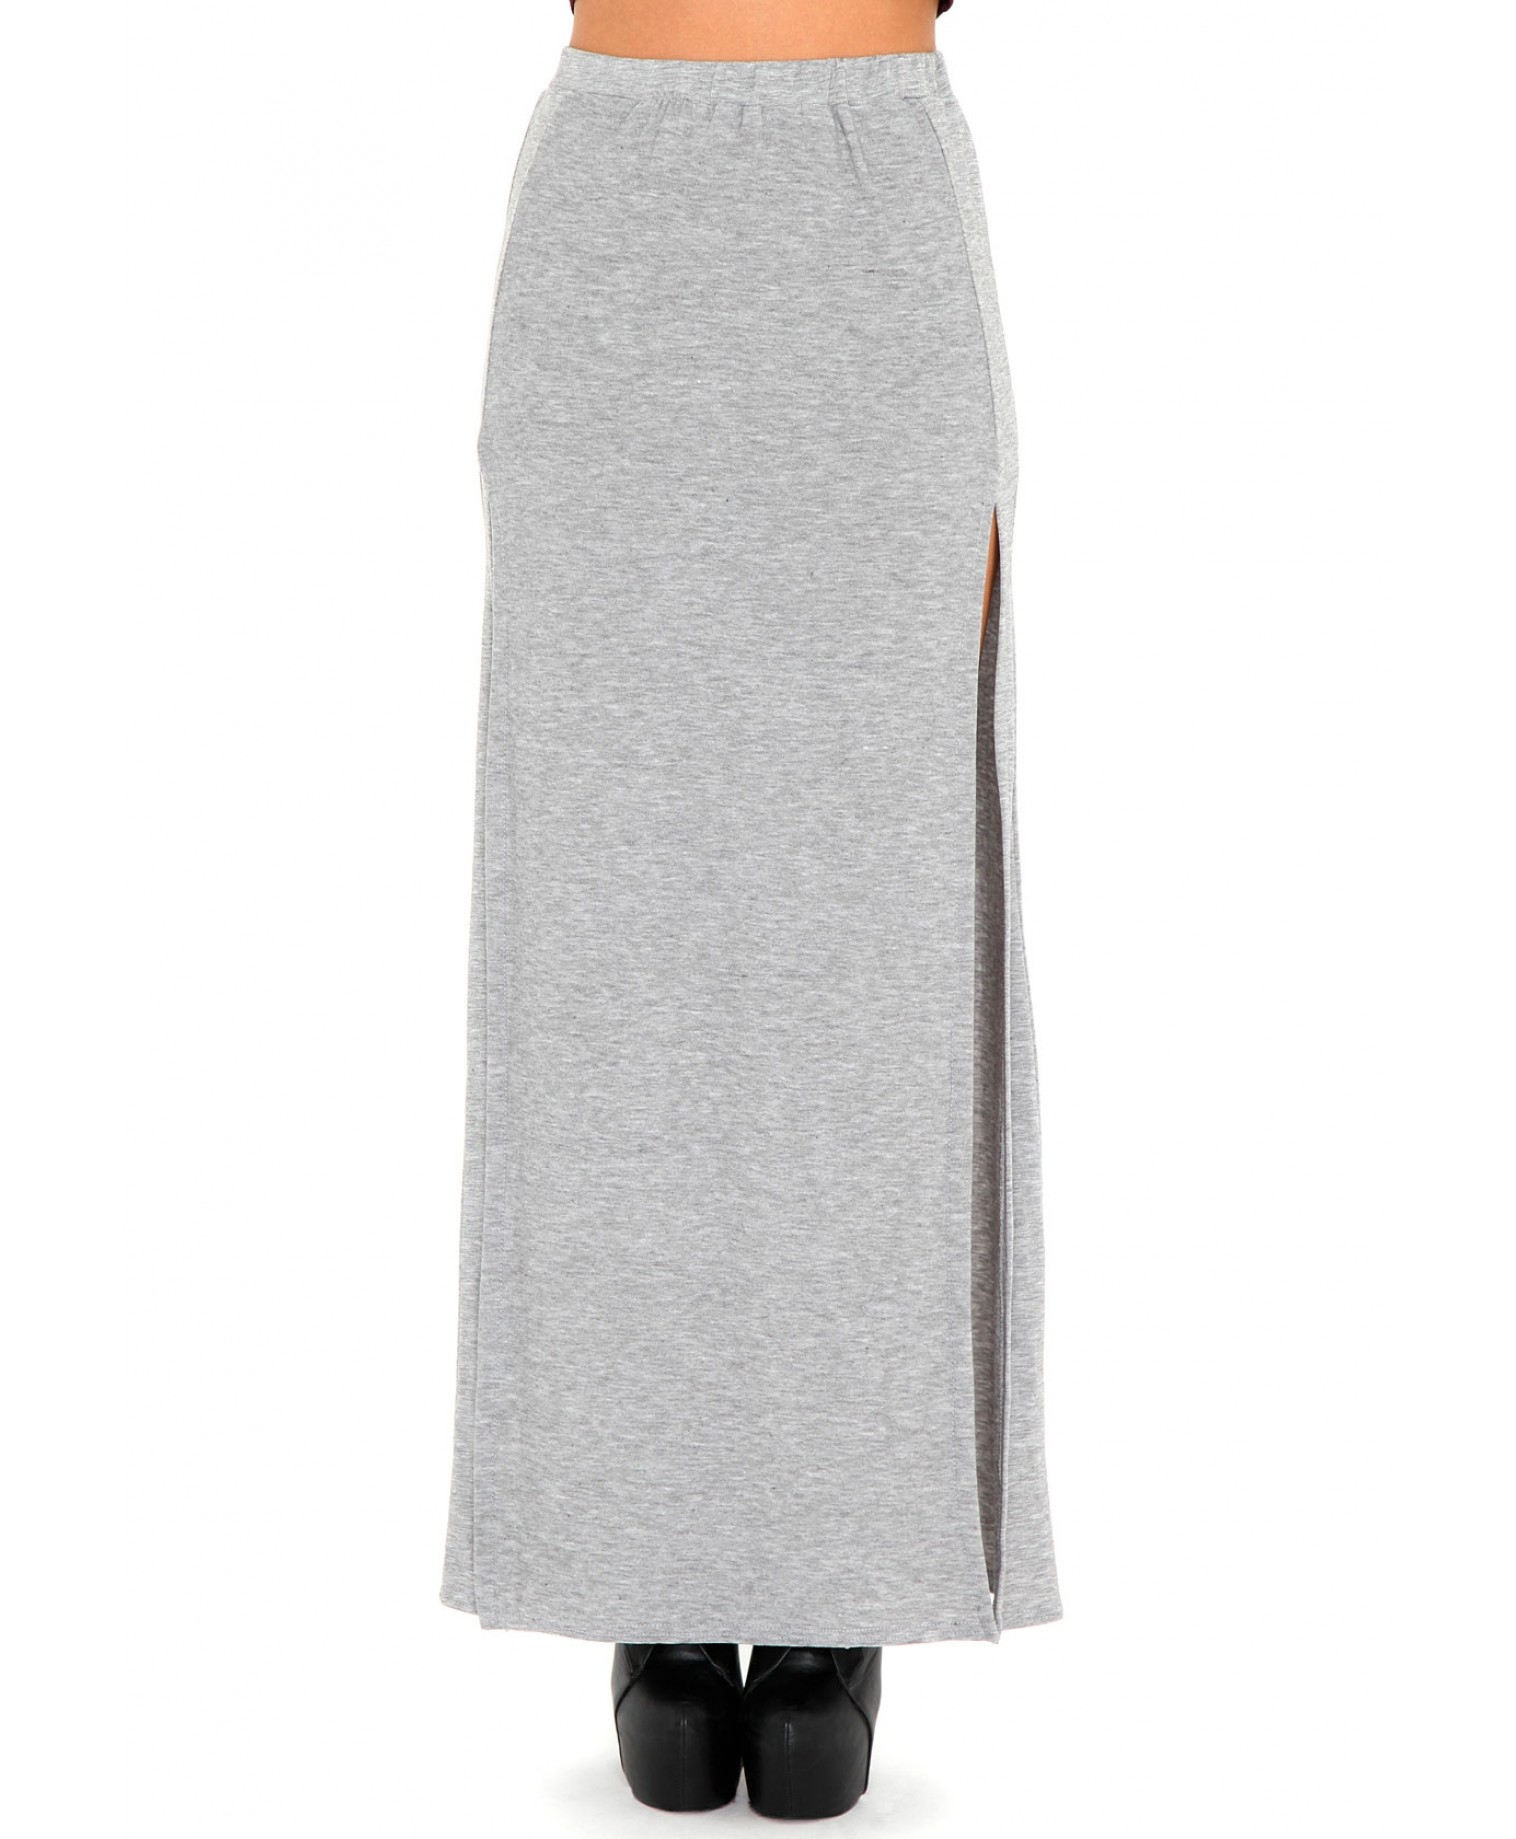 missguided madalyn split maxi skirt in grey in gray